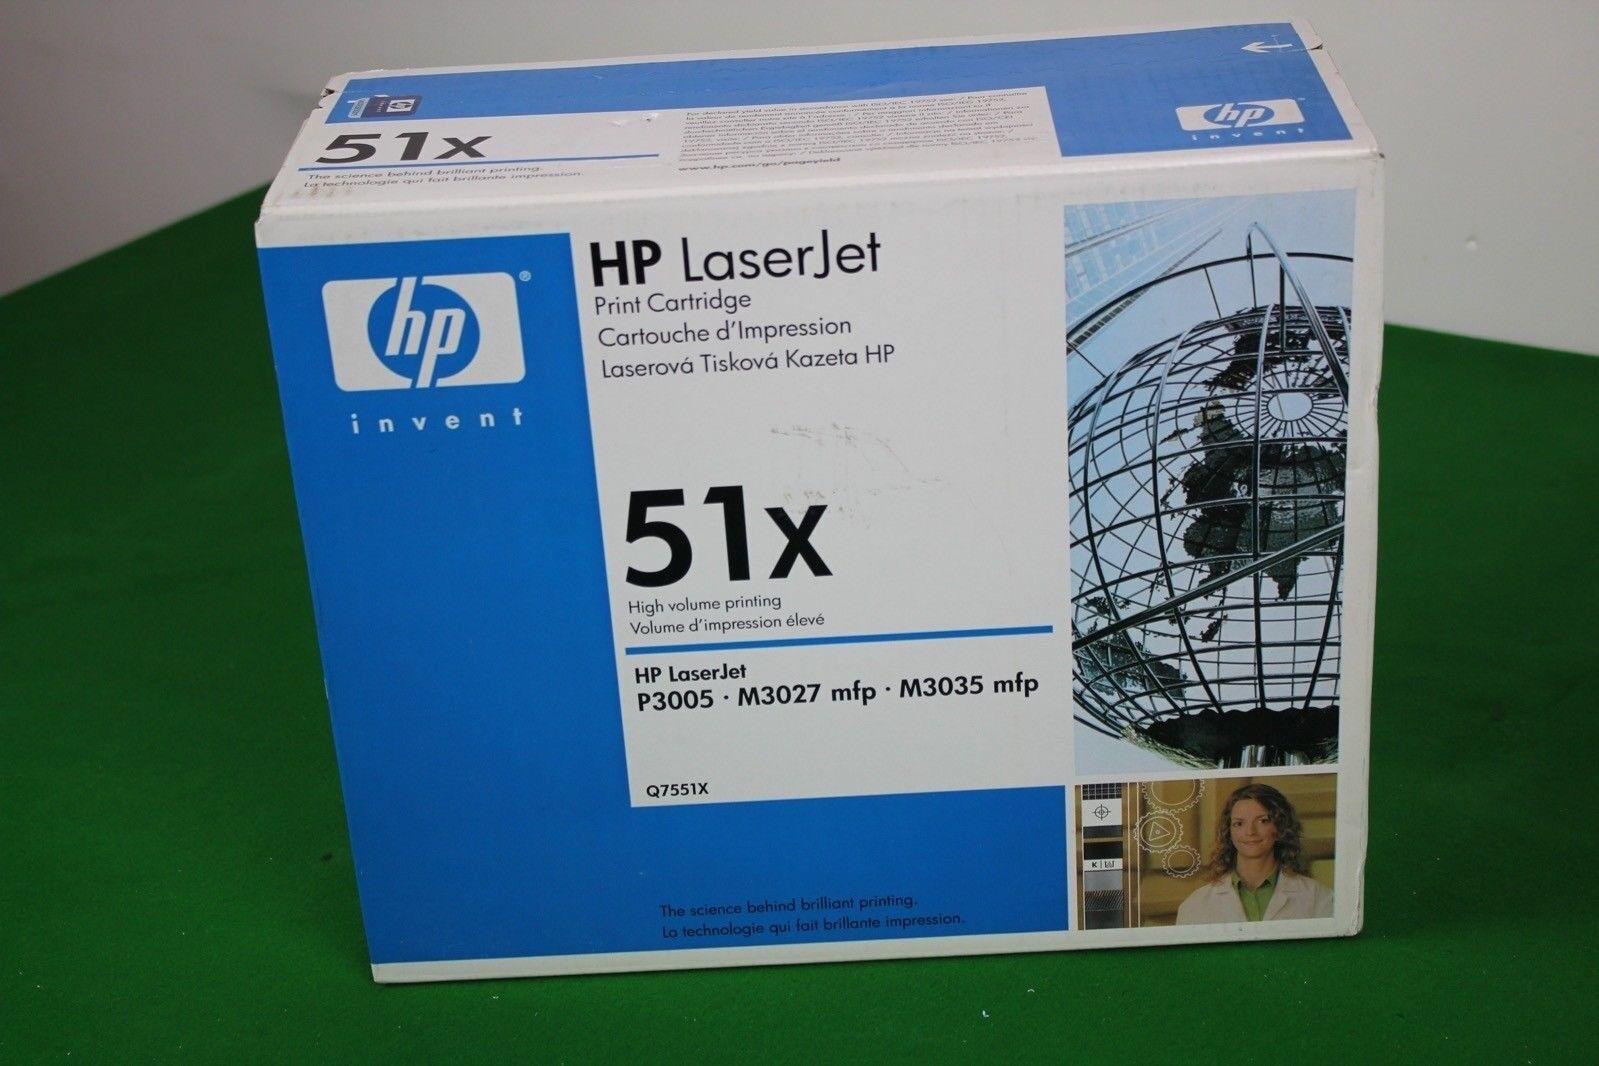 Used HP LaserJet 51X Print Cartridge, Office Toner Cartridge For